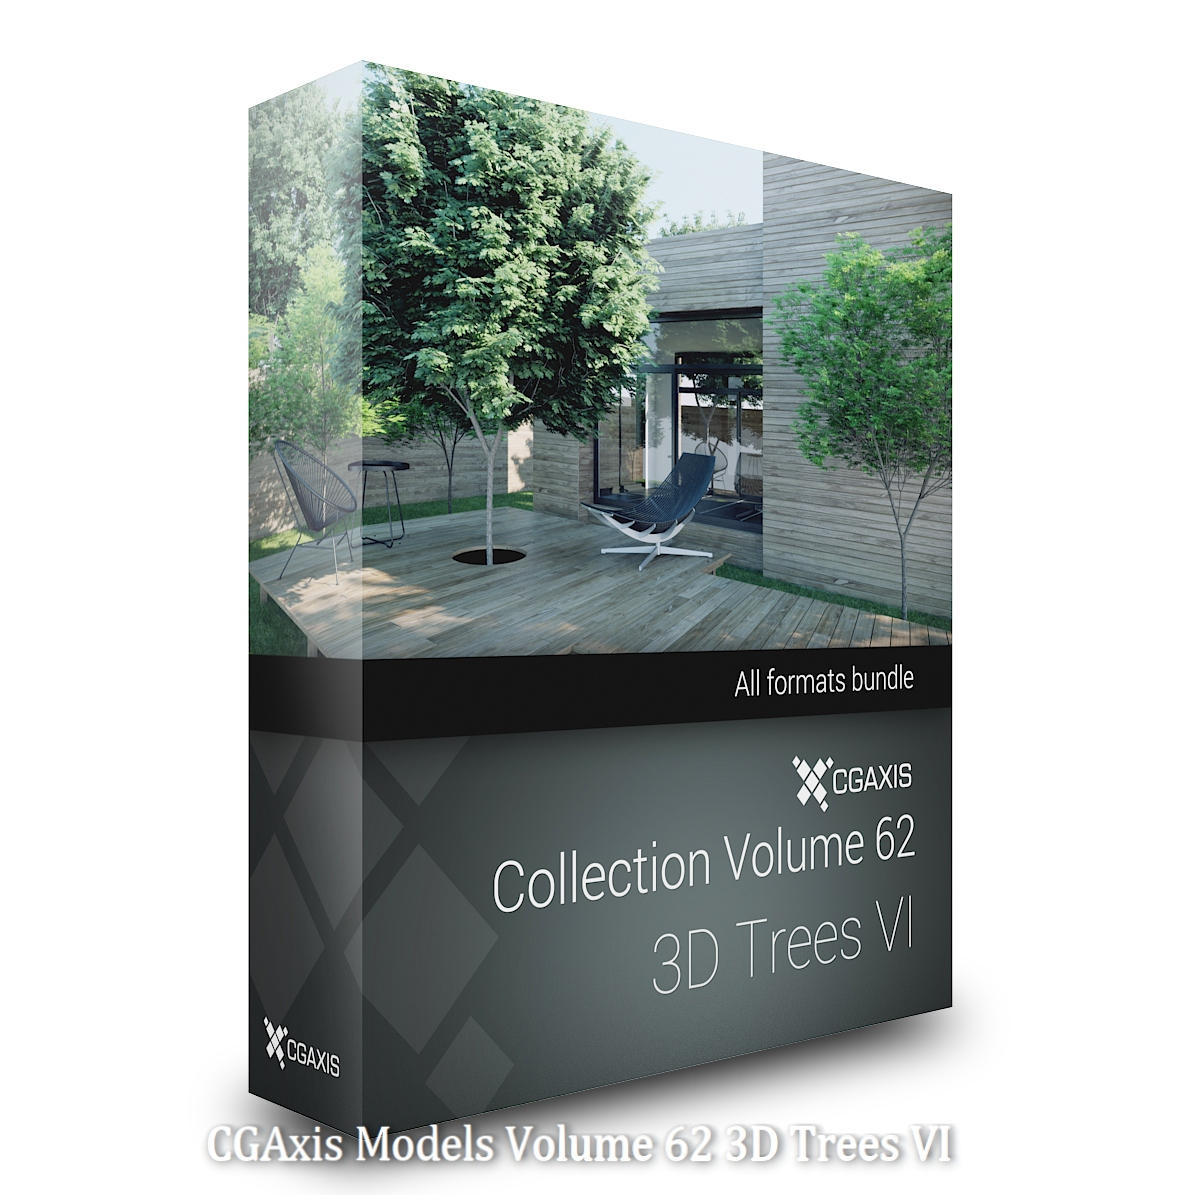 Download CGAxis Models 62 3D Trees VI